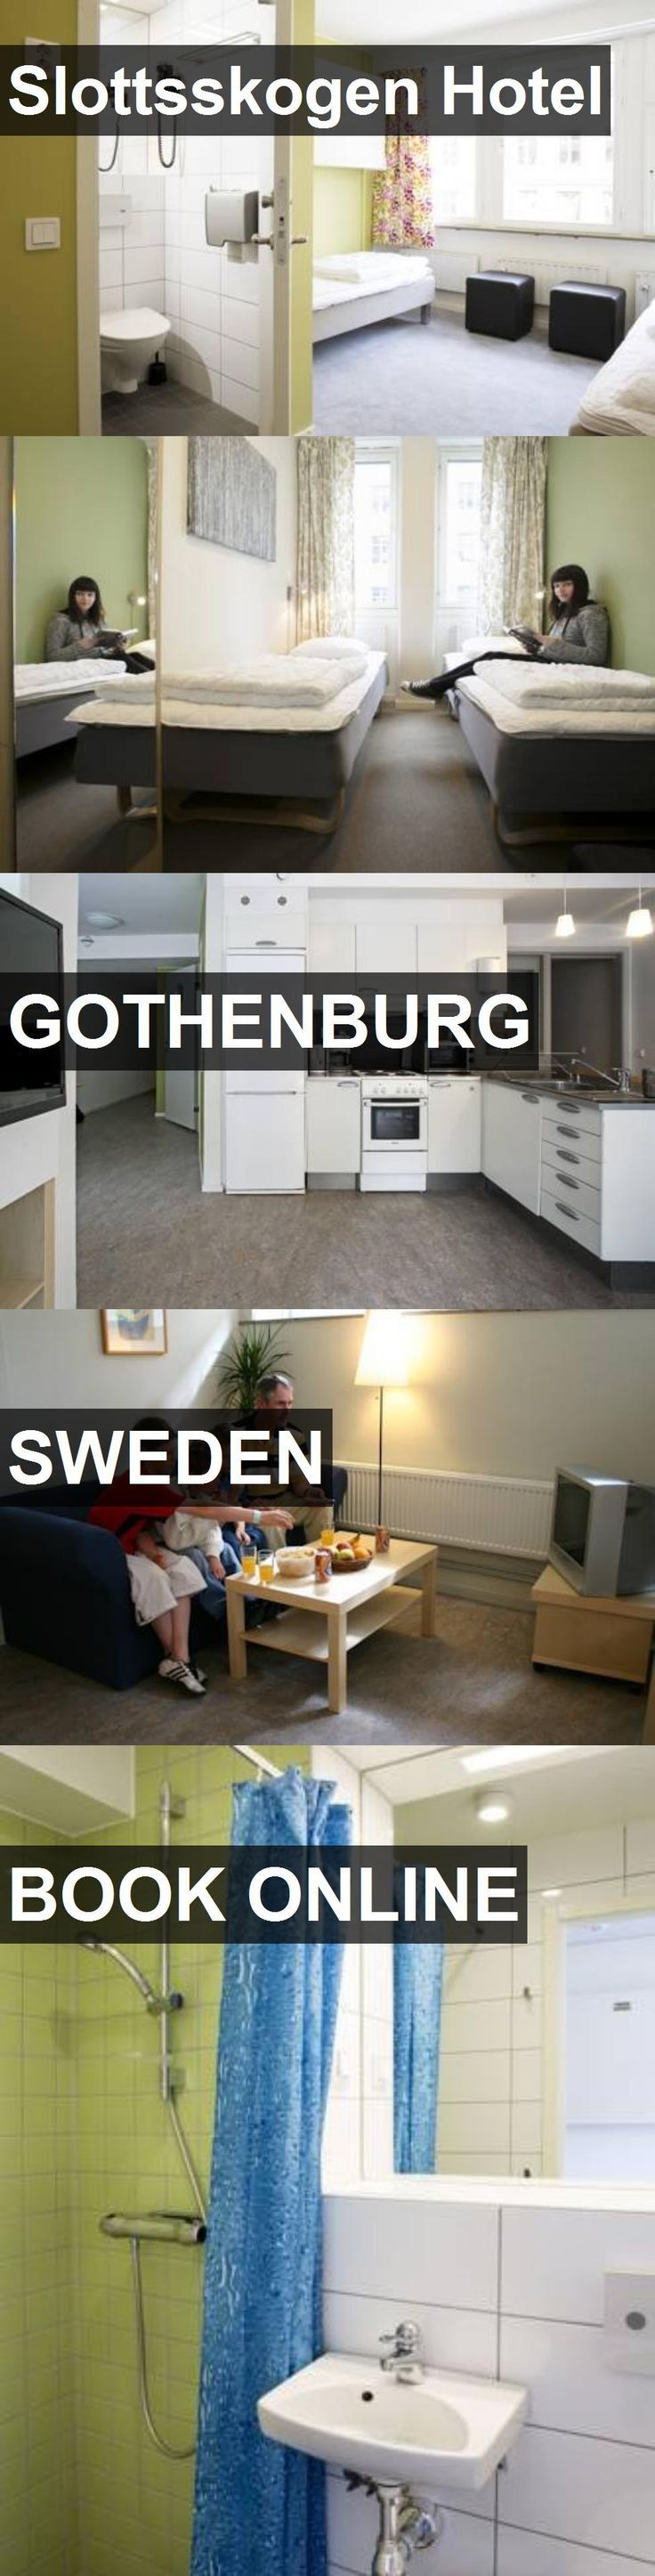 Slottsskogen Hotel in Gothenburg, Sweden. For more…